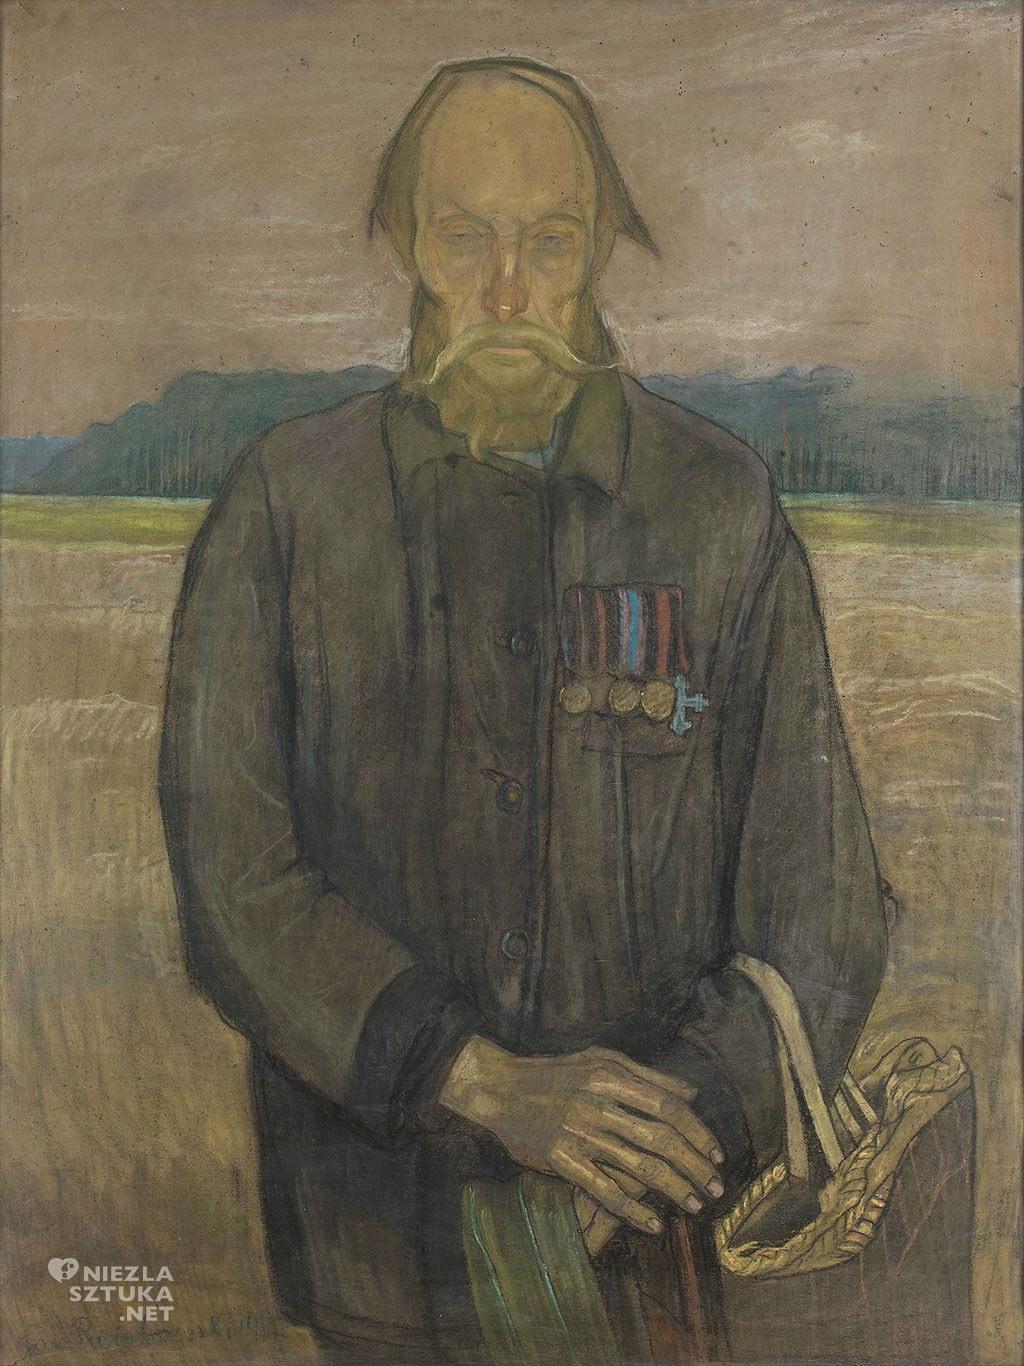 Jan Rembowski Inwalida - weteran